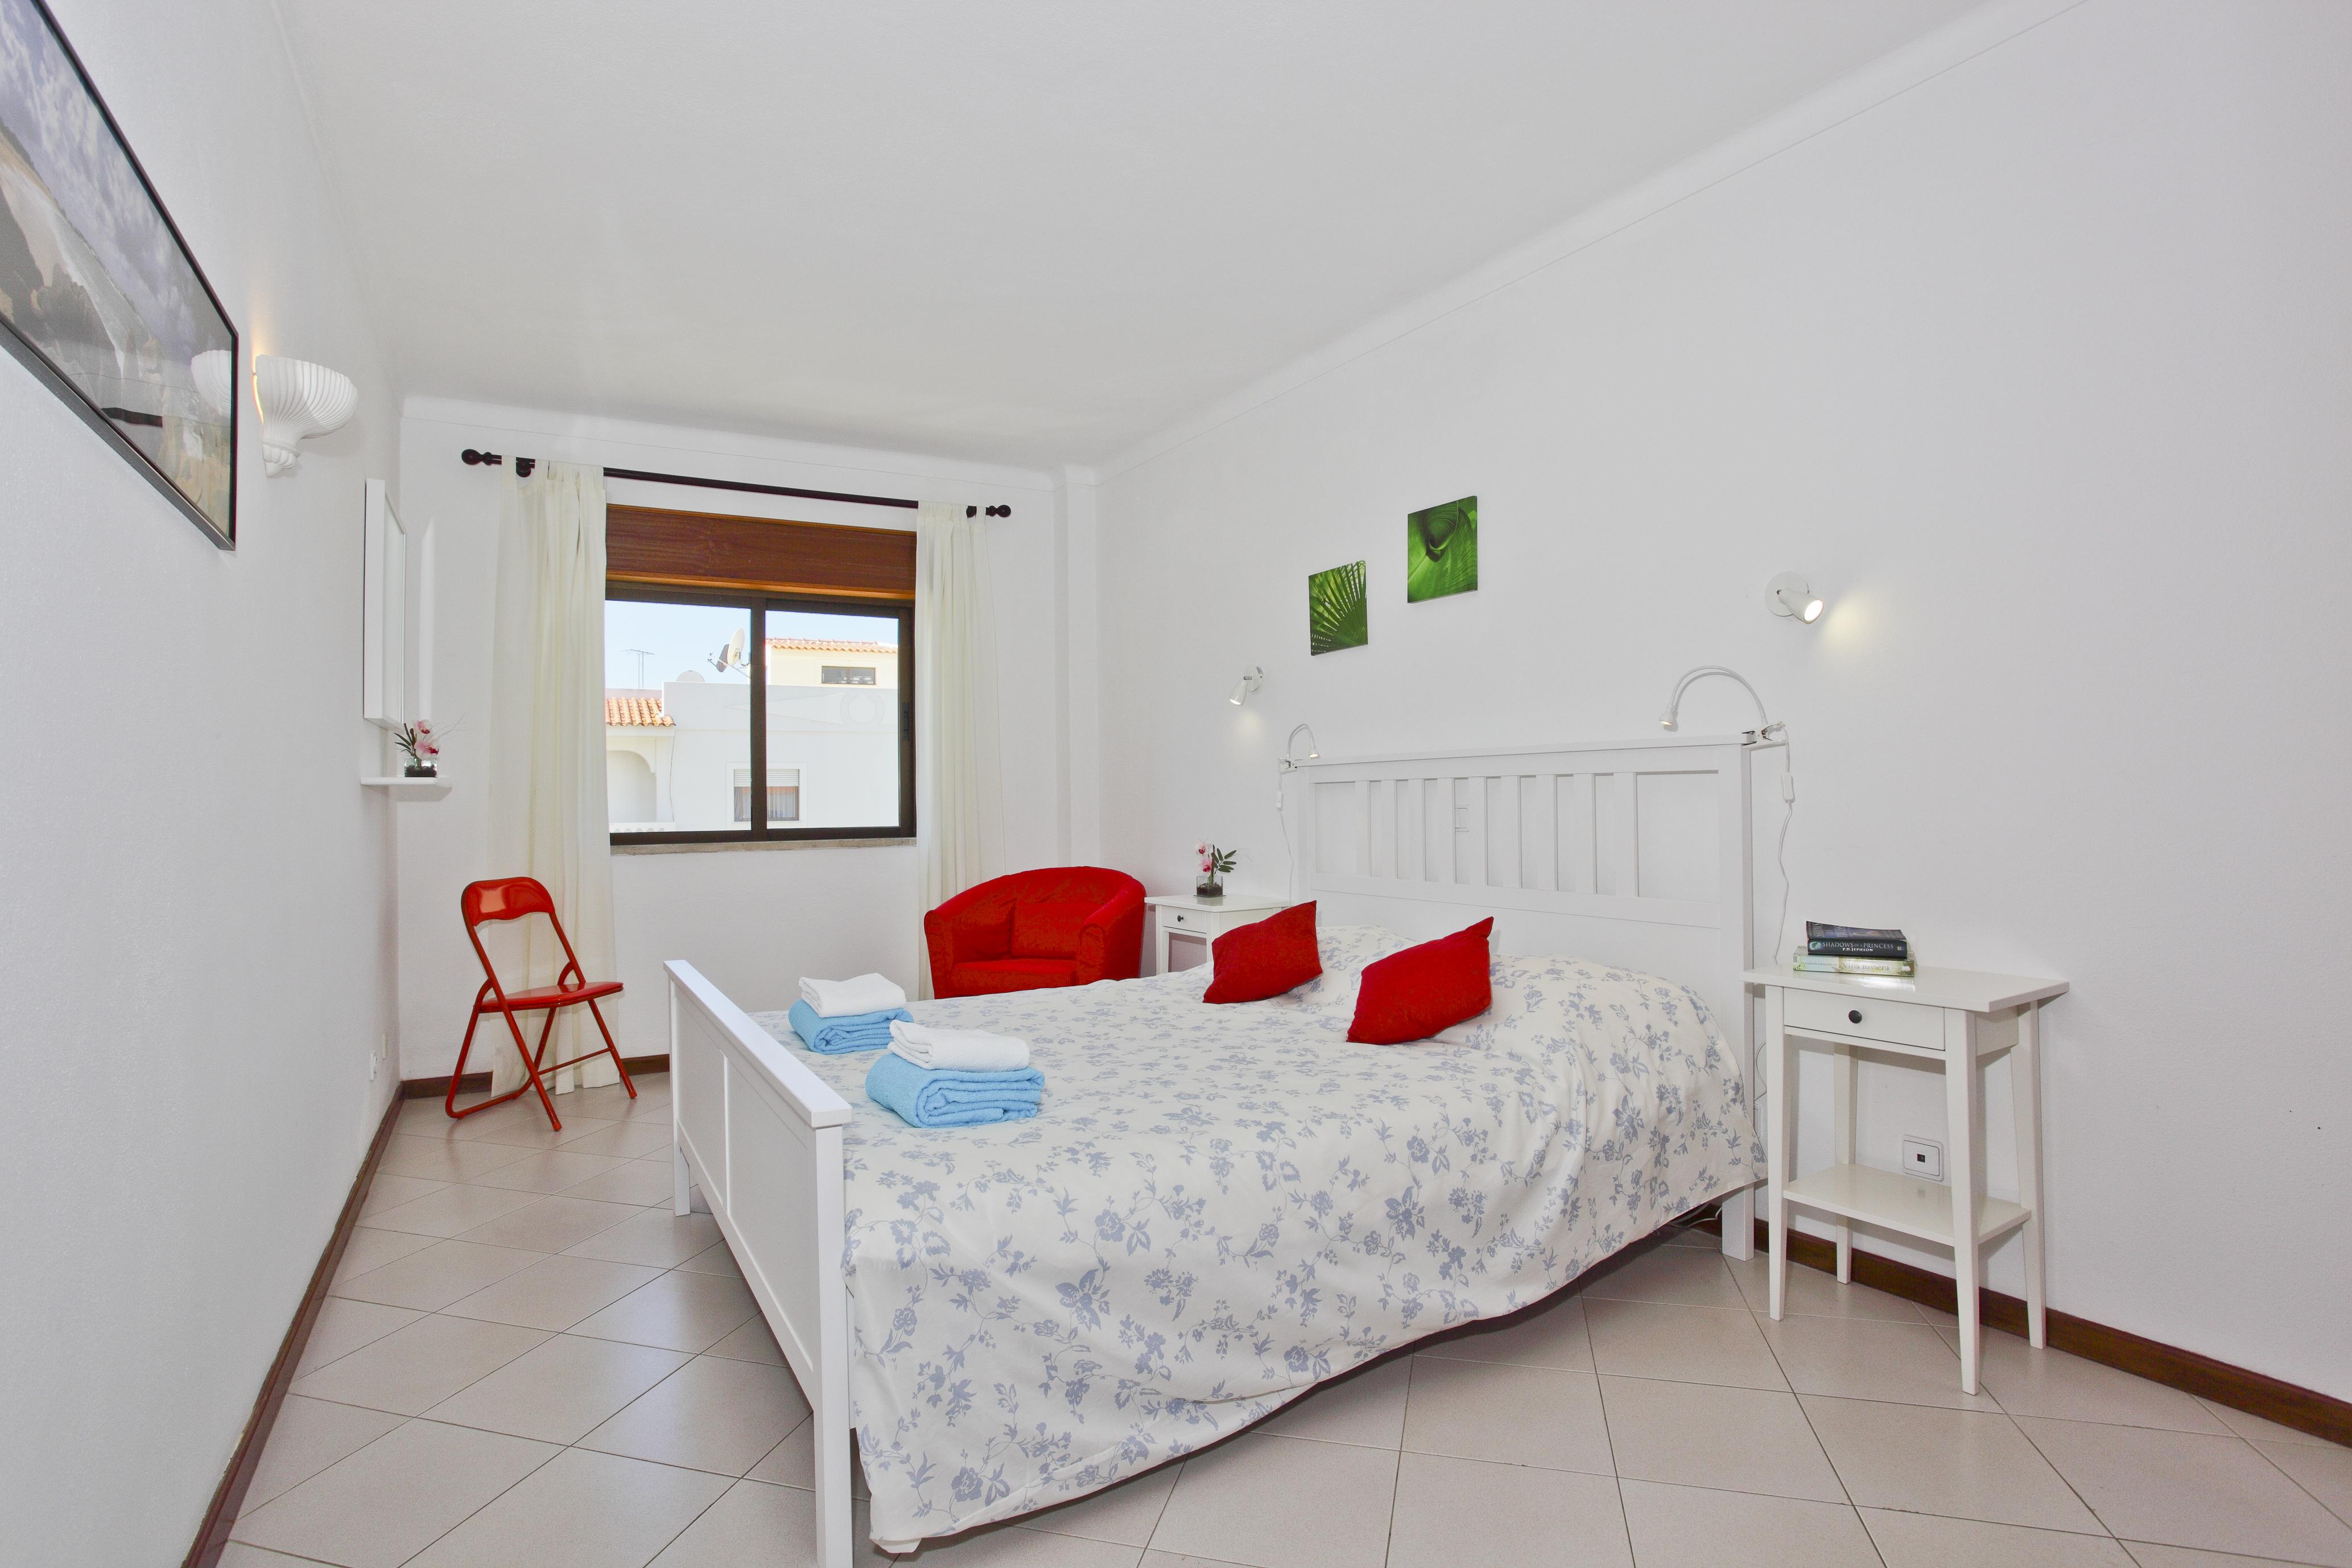 Holiday apartments and villas for rent, 2 Algarve Carvoeiro Apartments, sleeps 5 in Carvoeiro, Portugal Algarve, REF_IMG_12687_12692